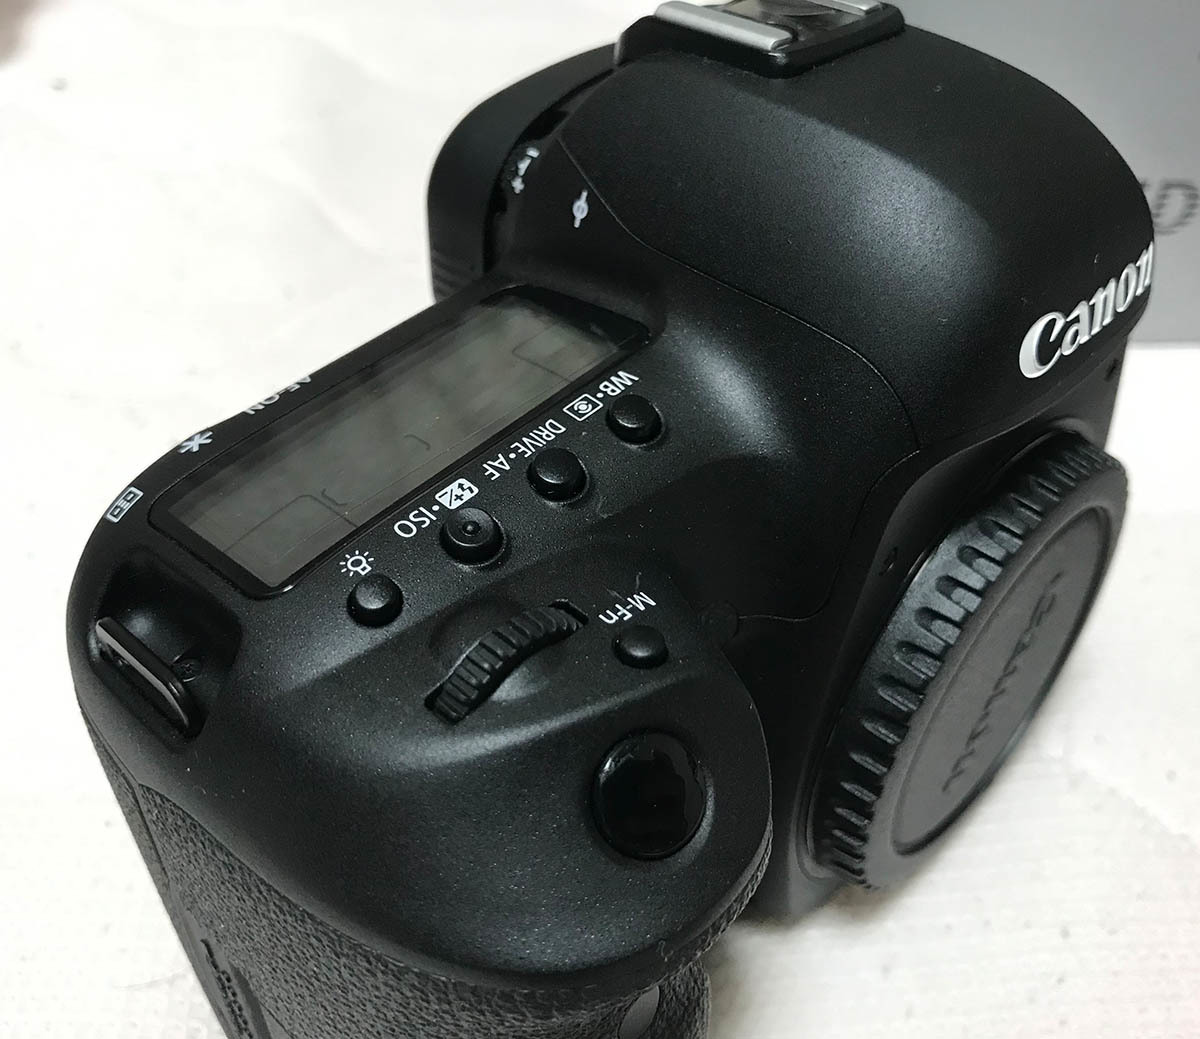 【Canon】キヤノン『EOS 5D Mark IV ボディー』EOS5DMK4 3040万画素 フルサイズ _画像3